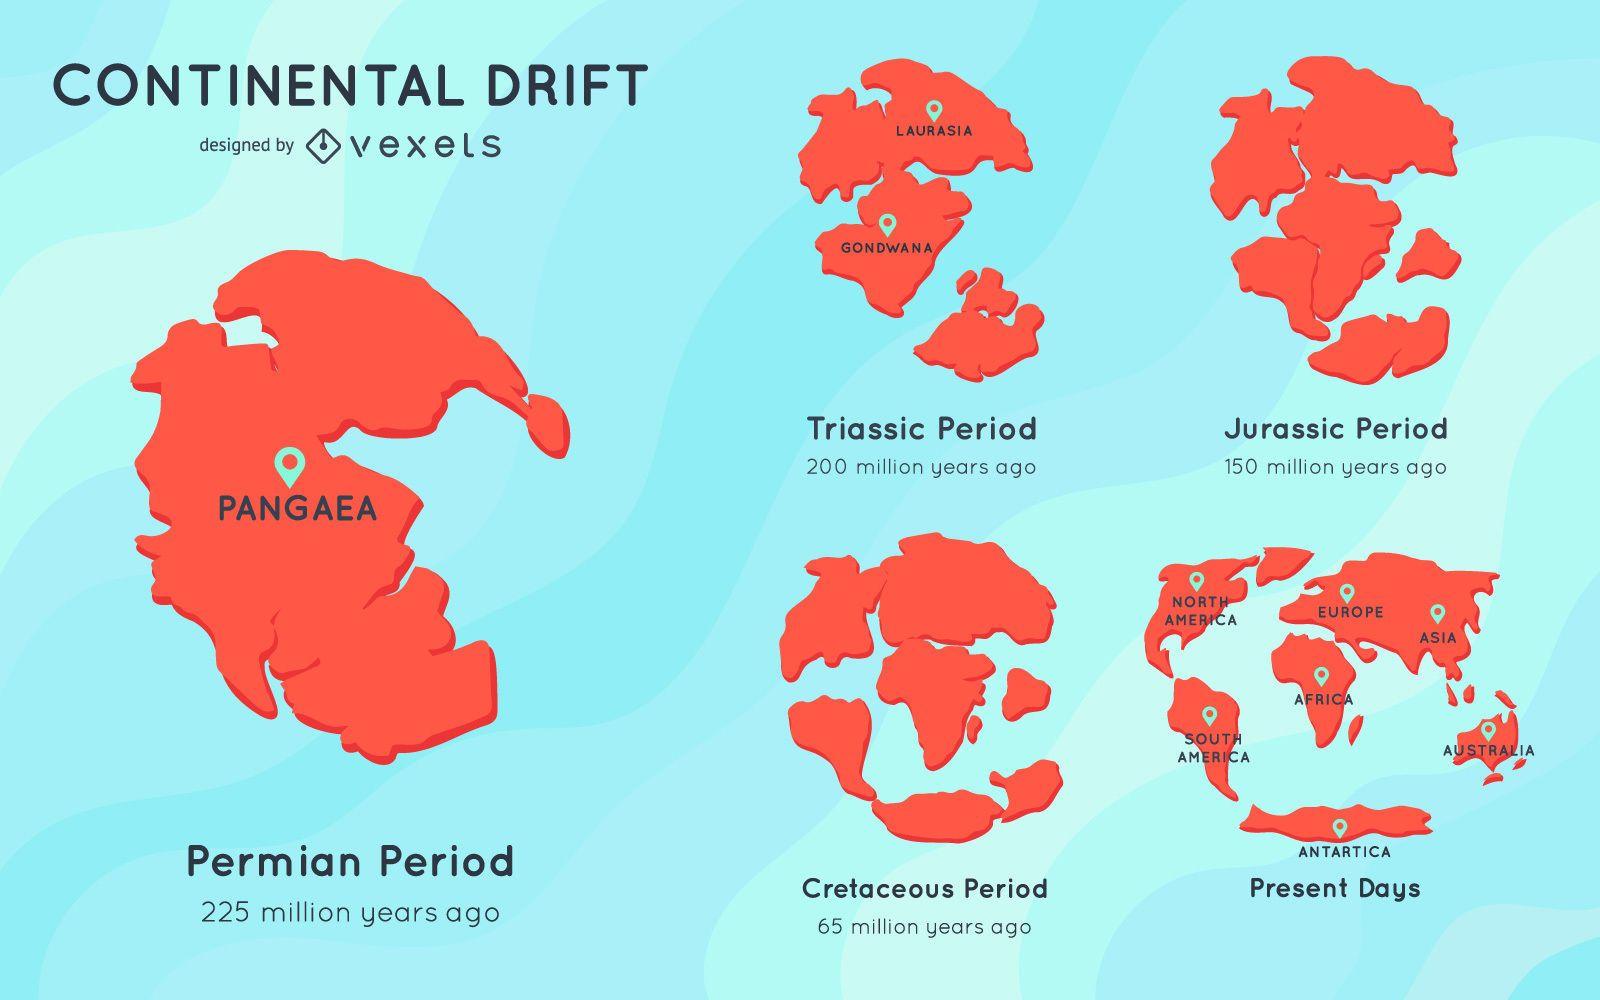 Continental drift illustration